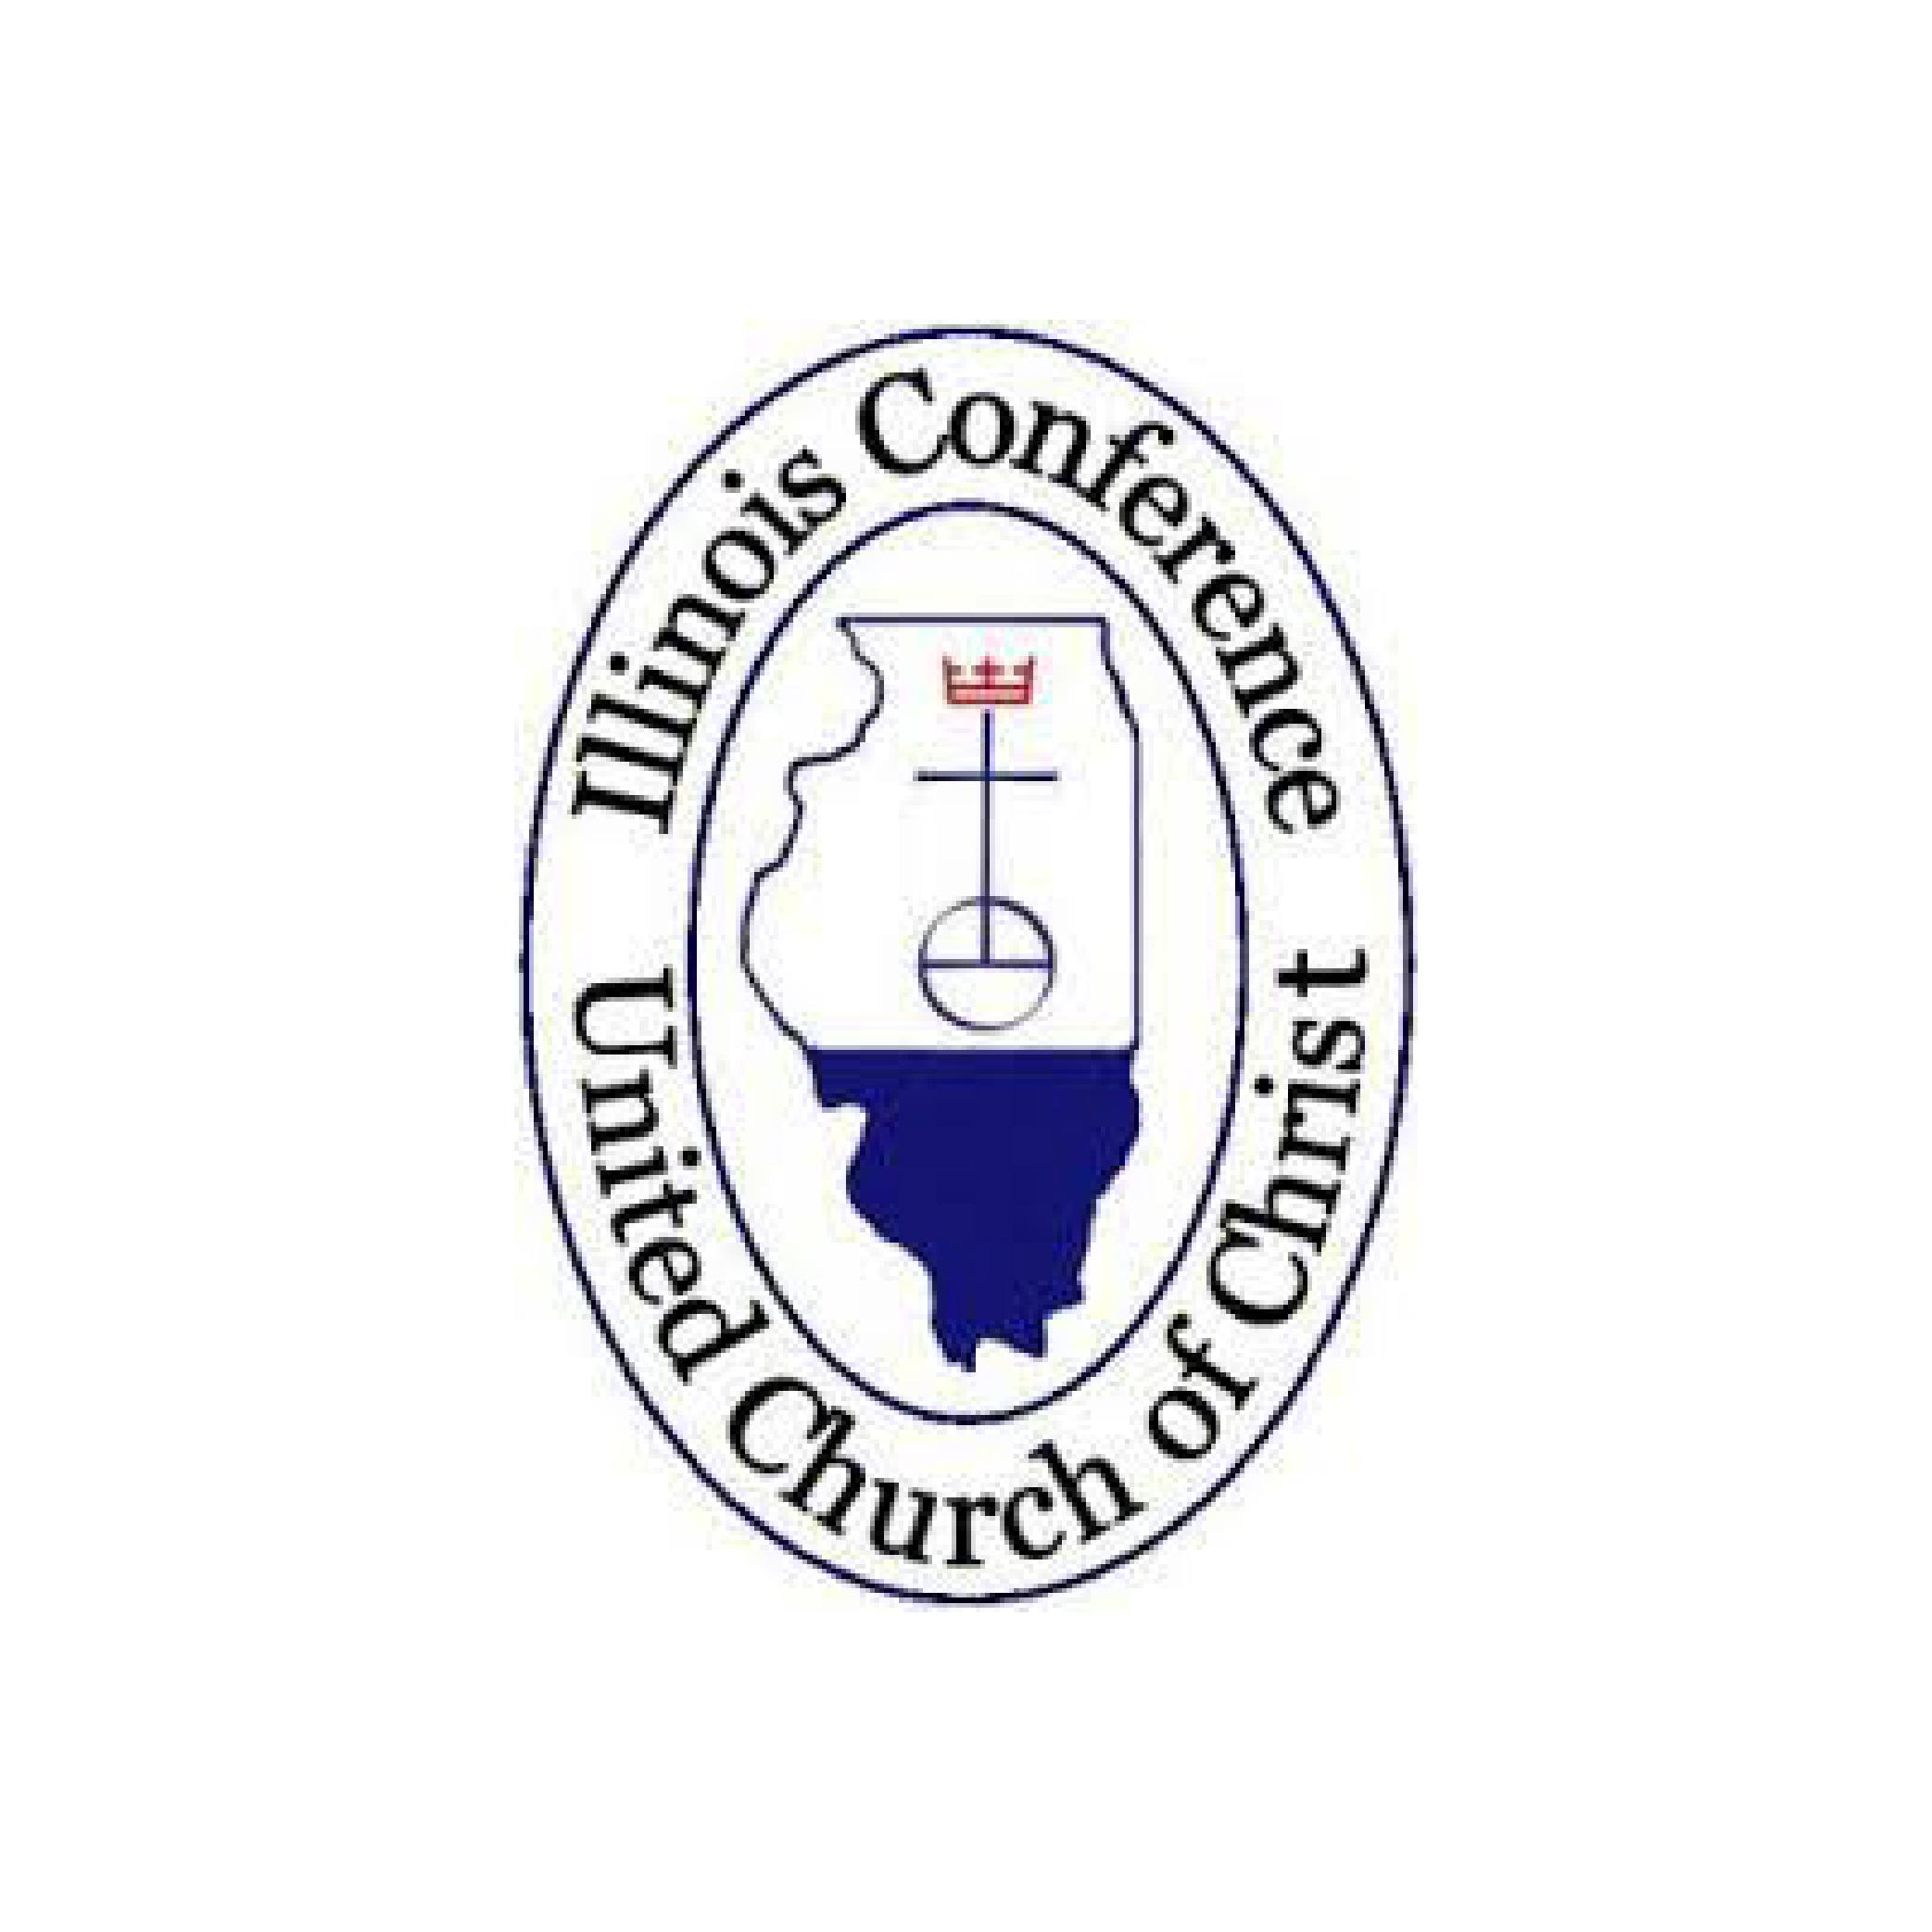 The Chicago Metropolitan Association